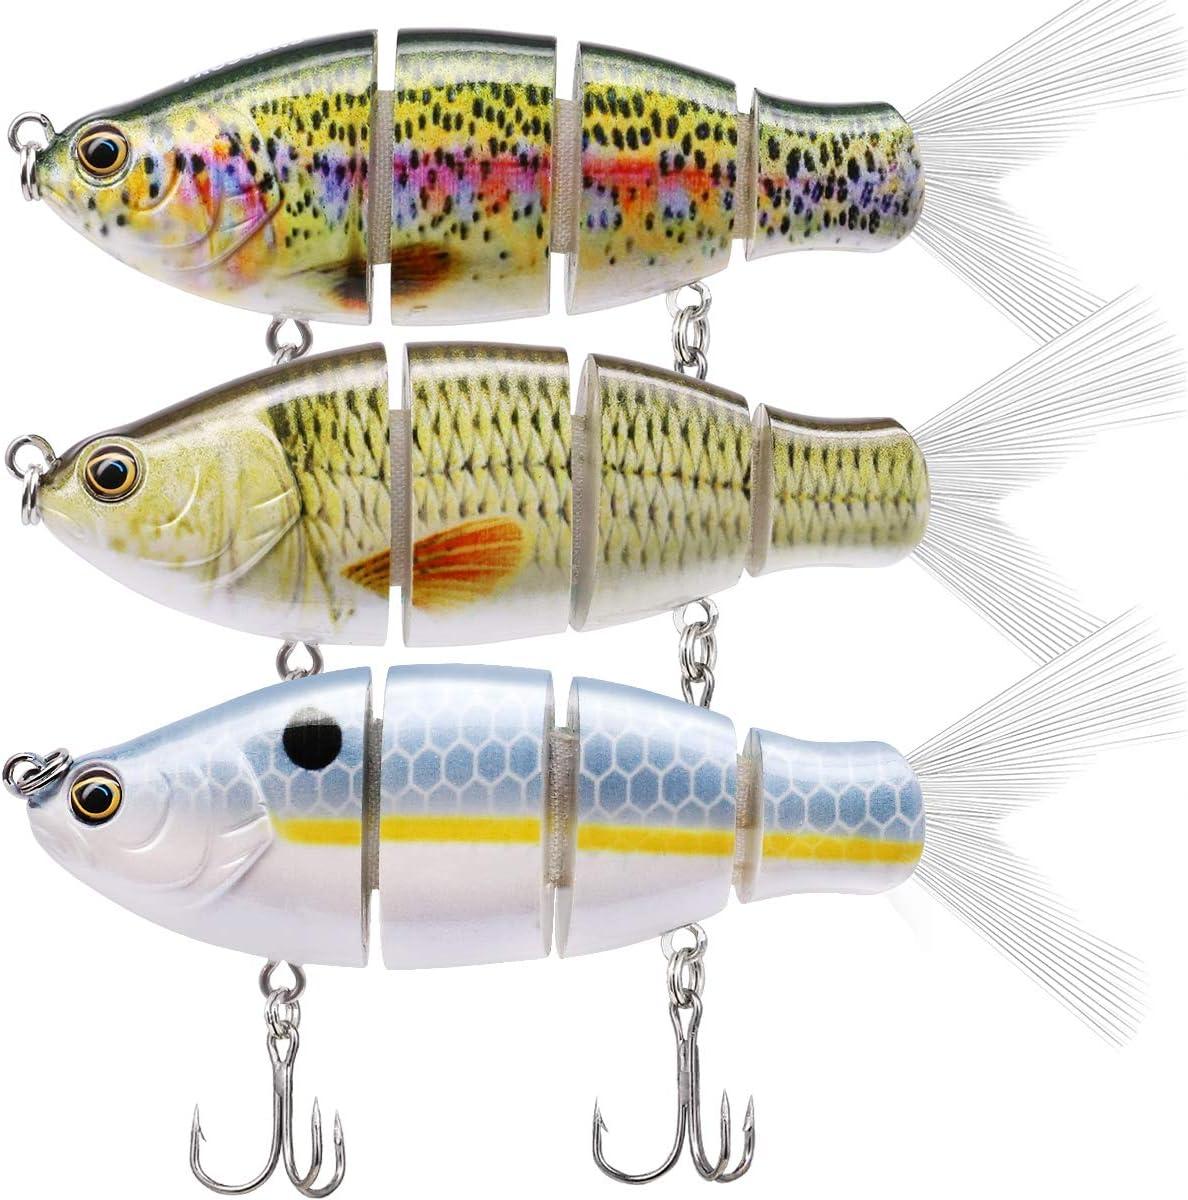 "Fishing Lures Swimbait Bass, 10cm 3.93"" Fishing Lures Crankbait Jointed Trout Swimbait Mustad Hooks (Combo C) : Sports & Outdoors"